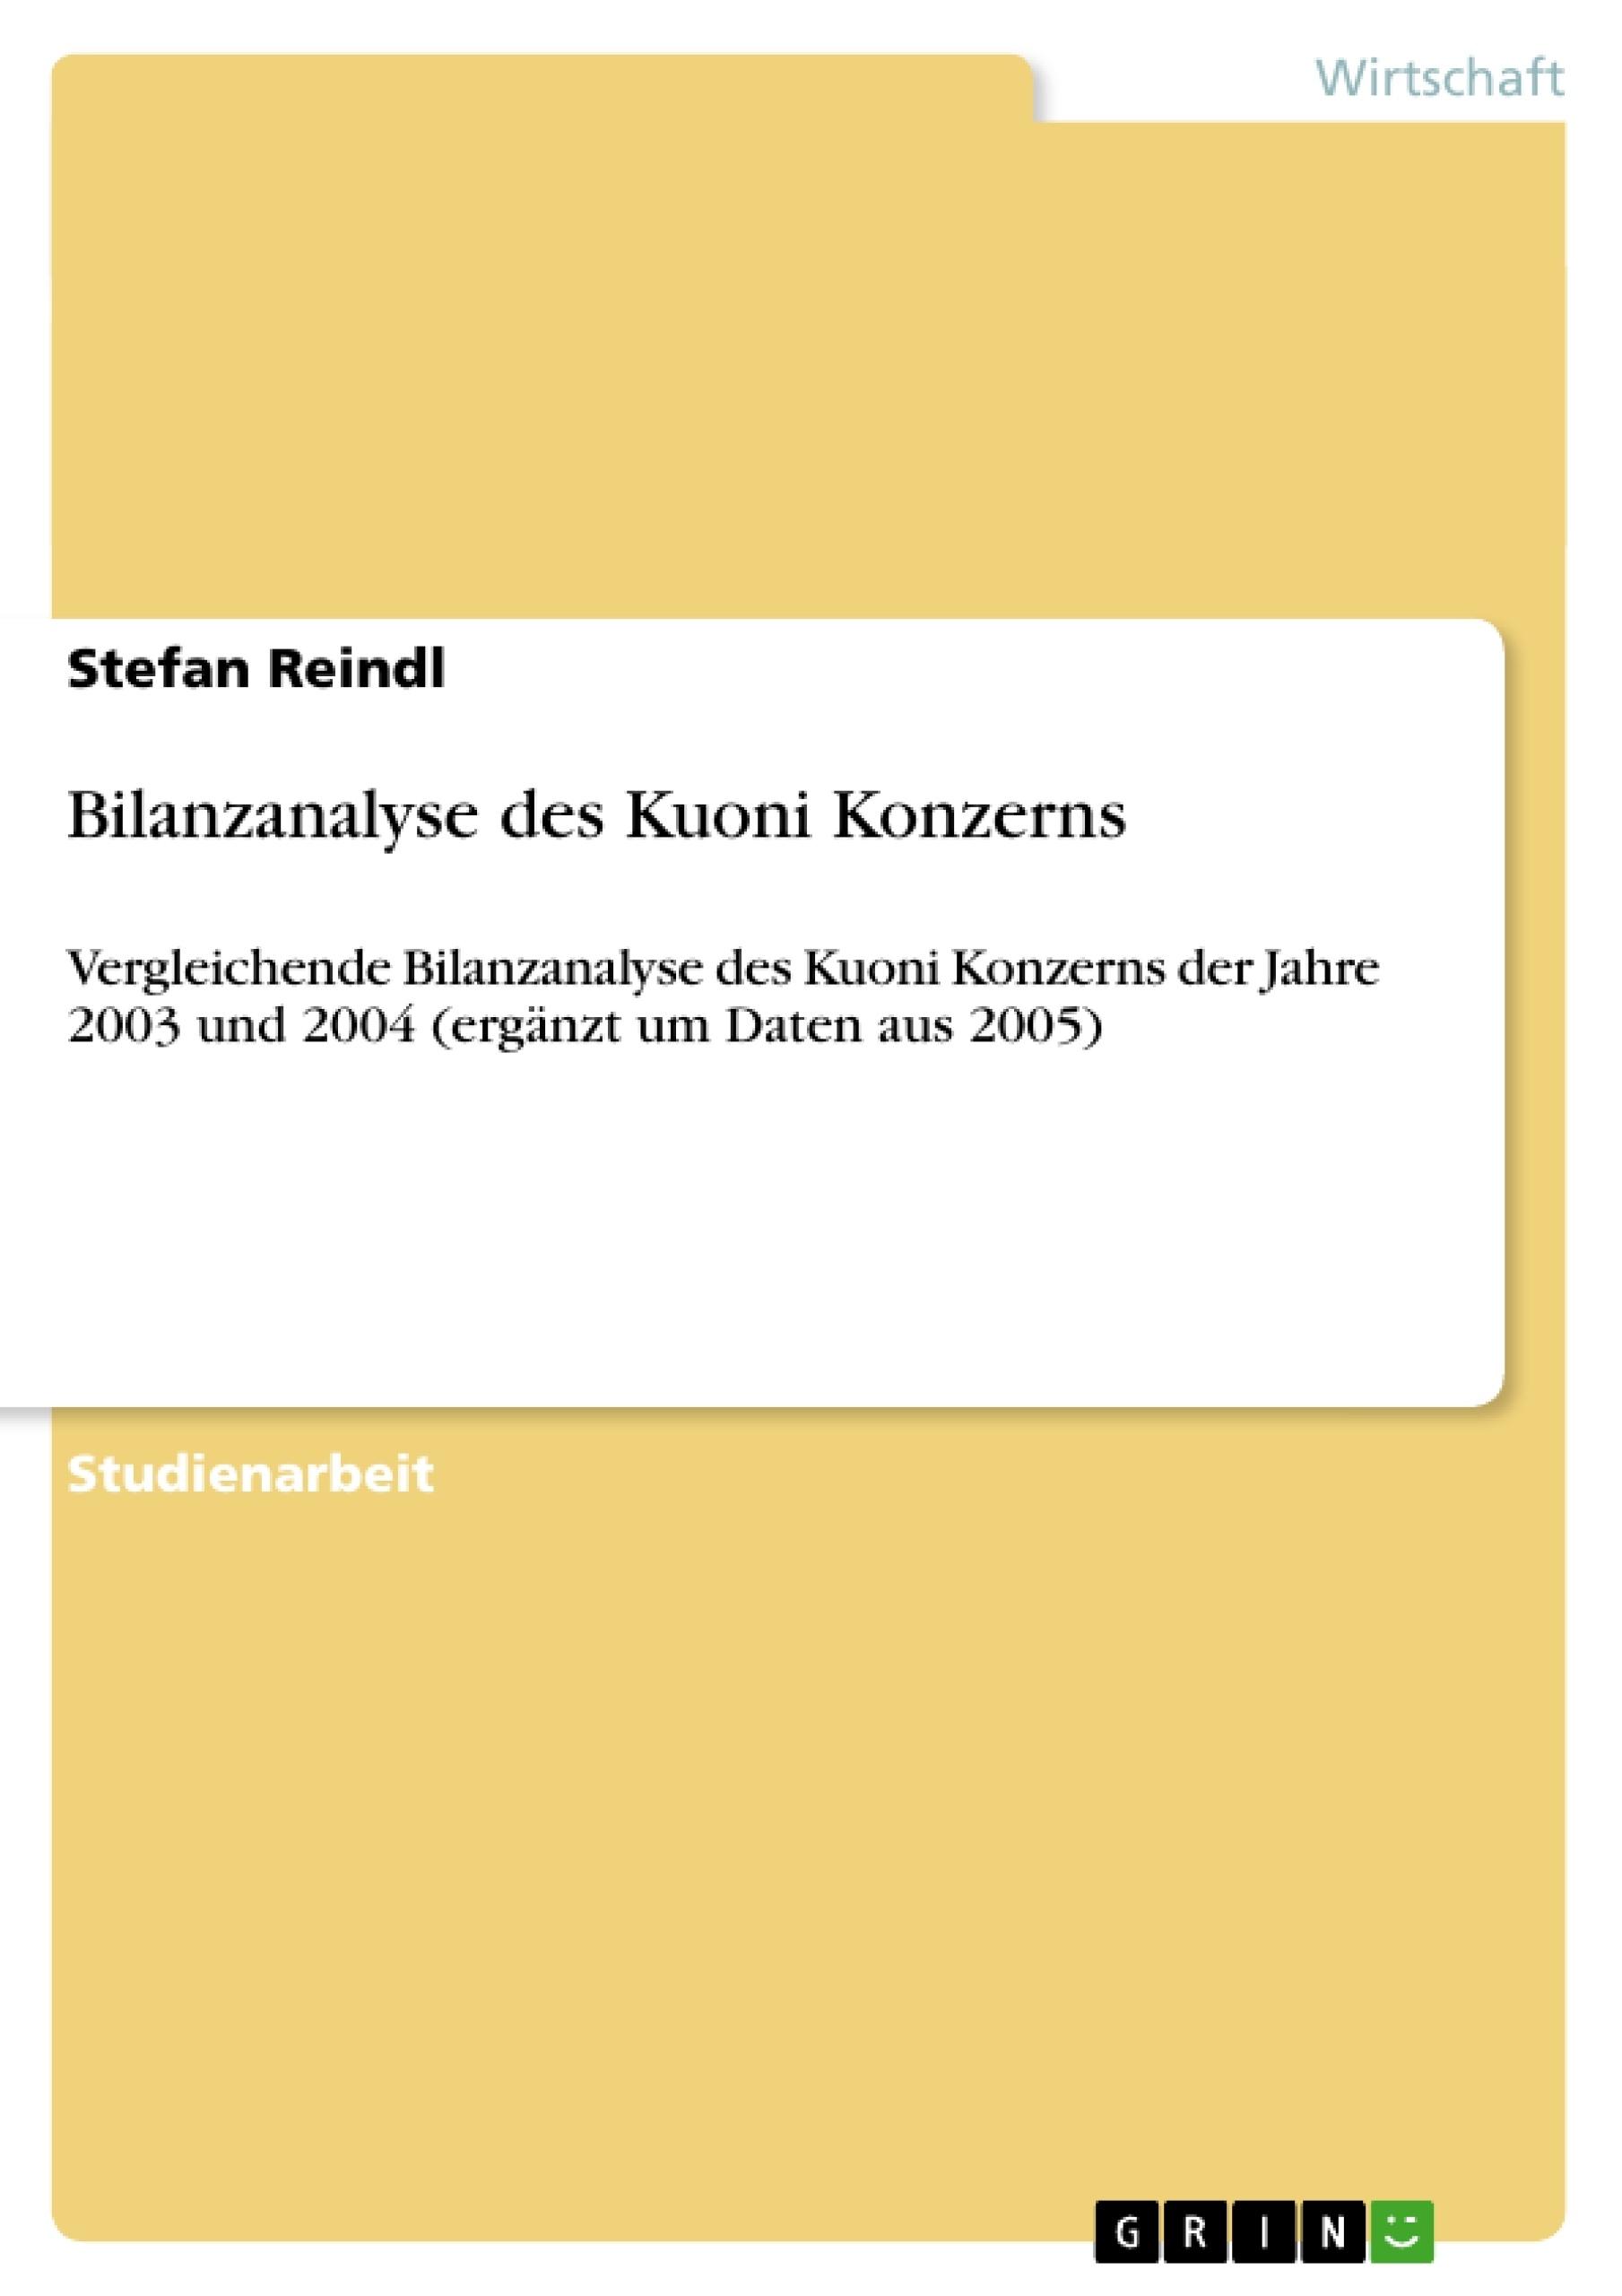 Titel: Bilanzanalyse des Kuoni Konzerns